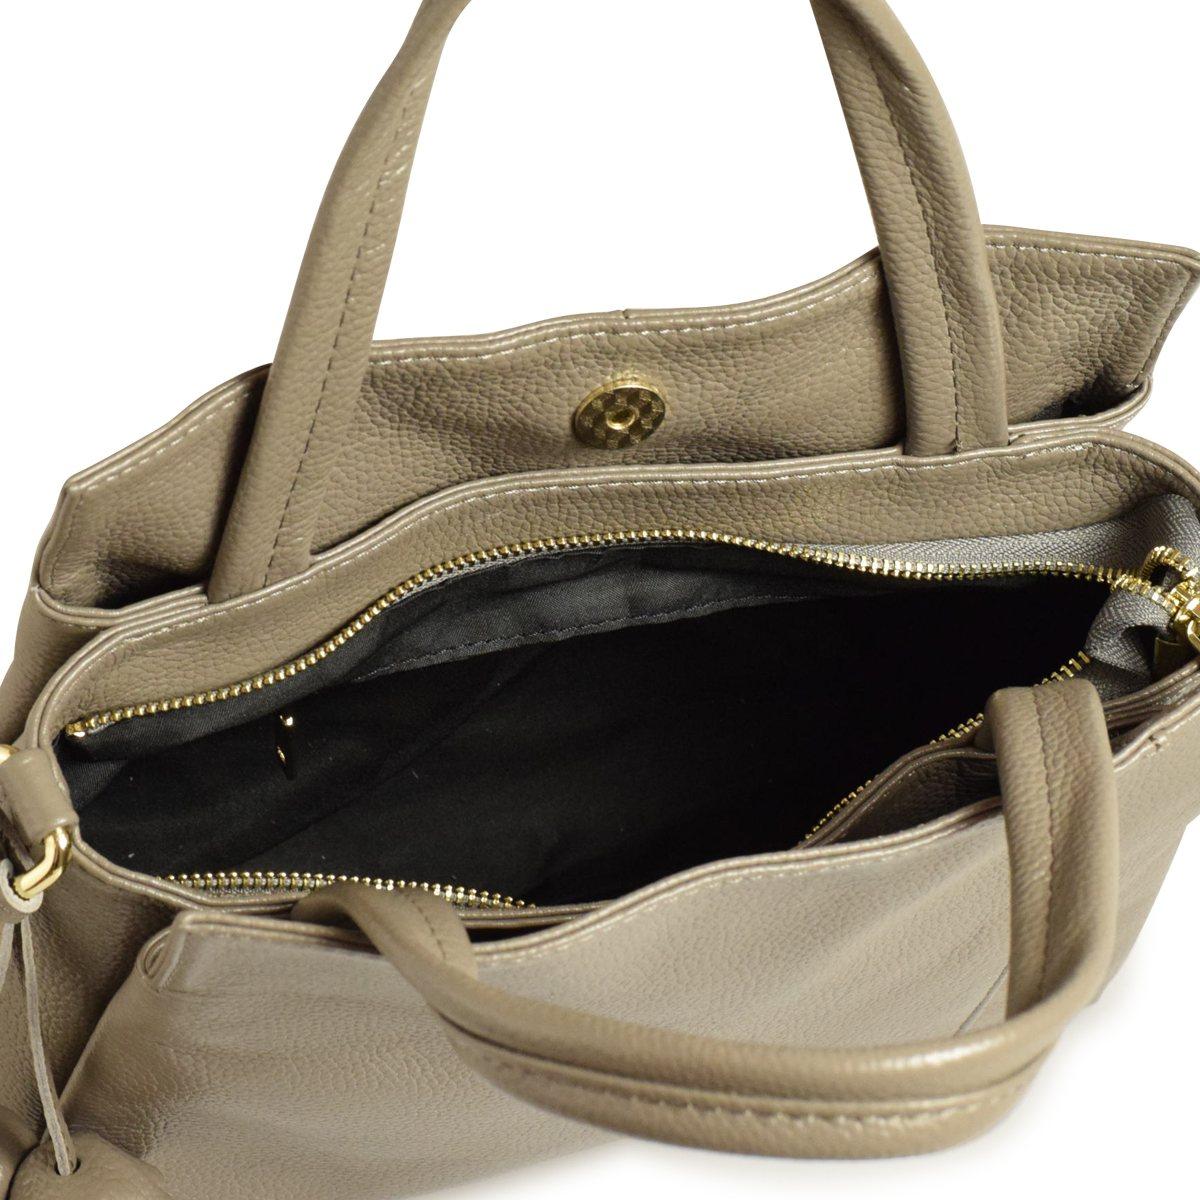 139a3c3f02ec ... バルコスBARCOSハンドバッグショルダーバッグ斜め掛け2wayレザー本革シュリンクレザーバッグ鞄カバン ...